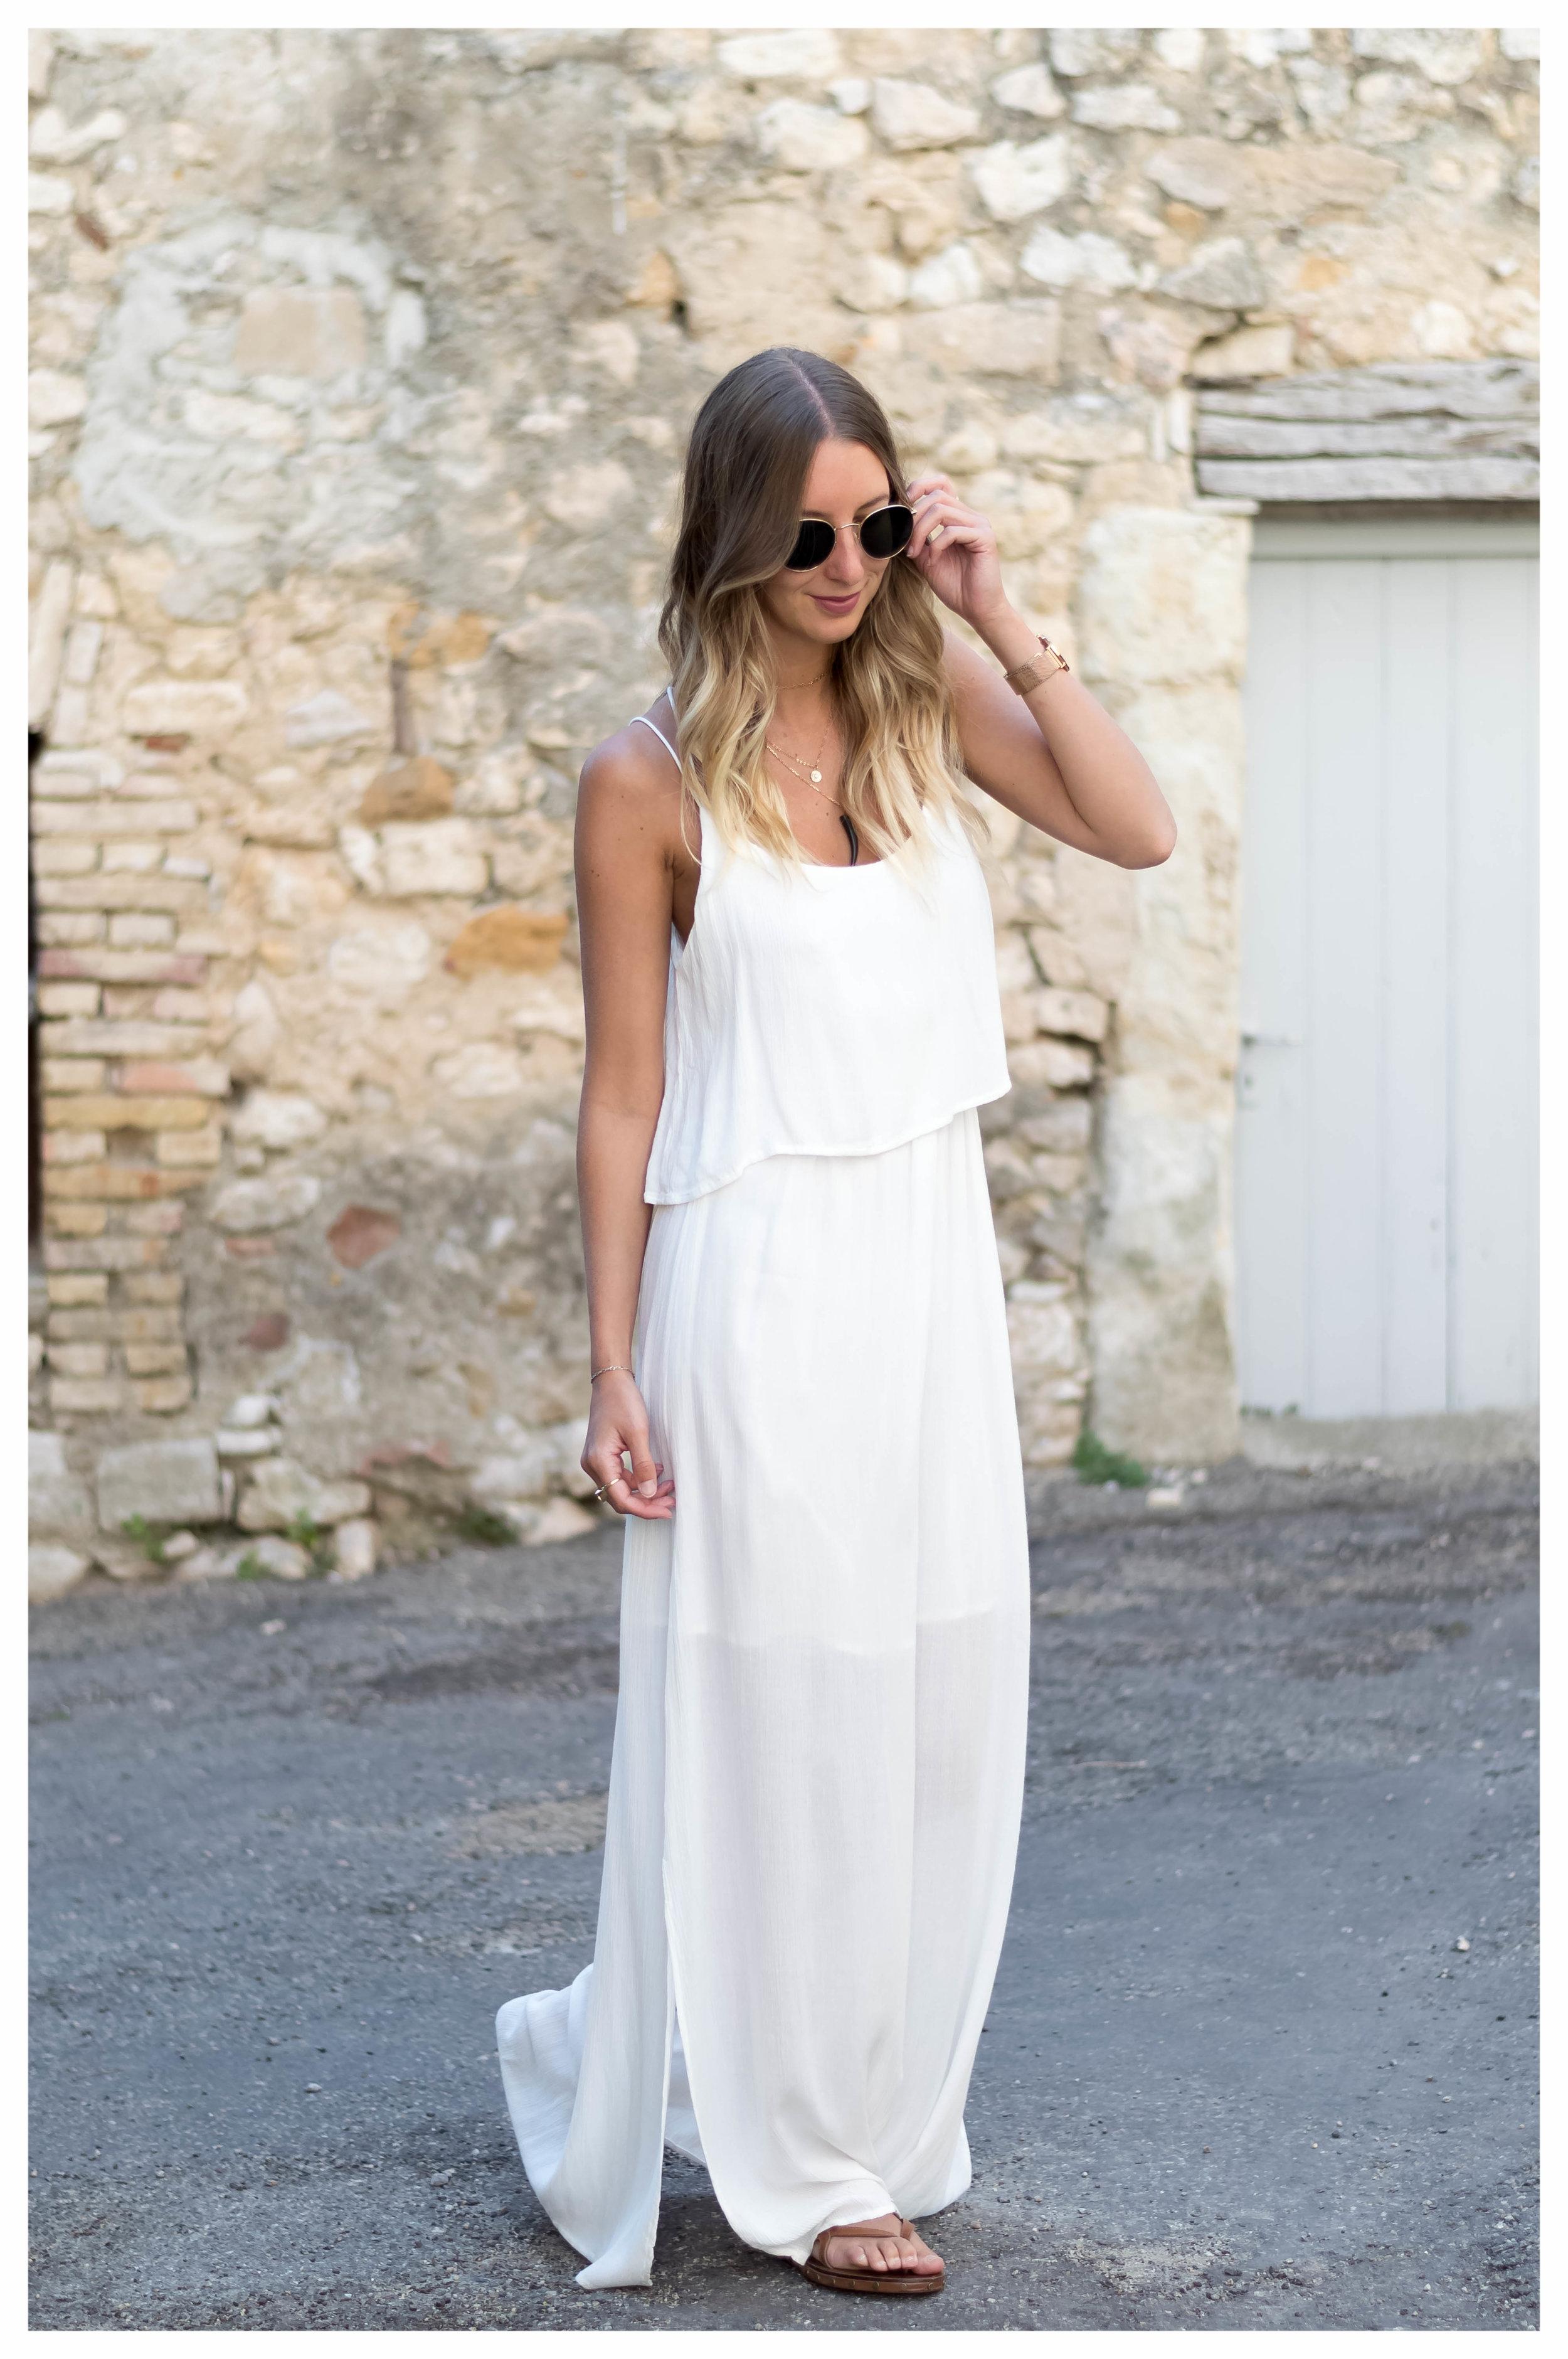 White Dress - OSIARAH.COM (4 sur 16).jpg